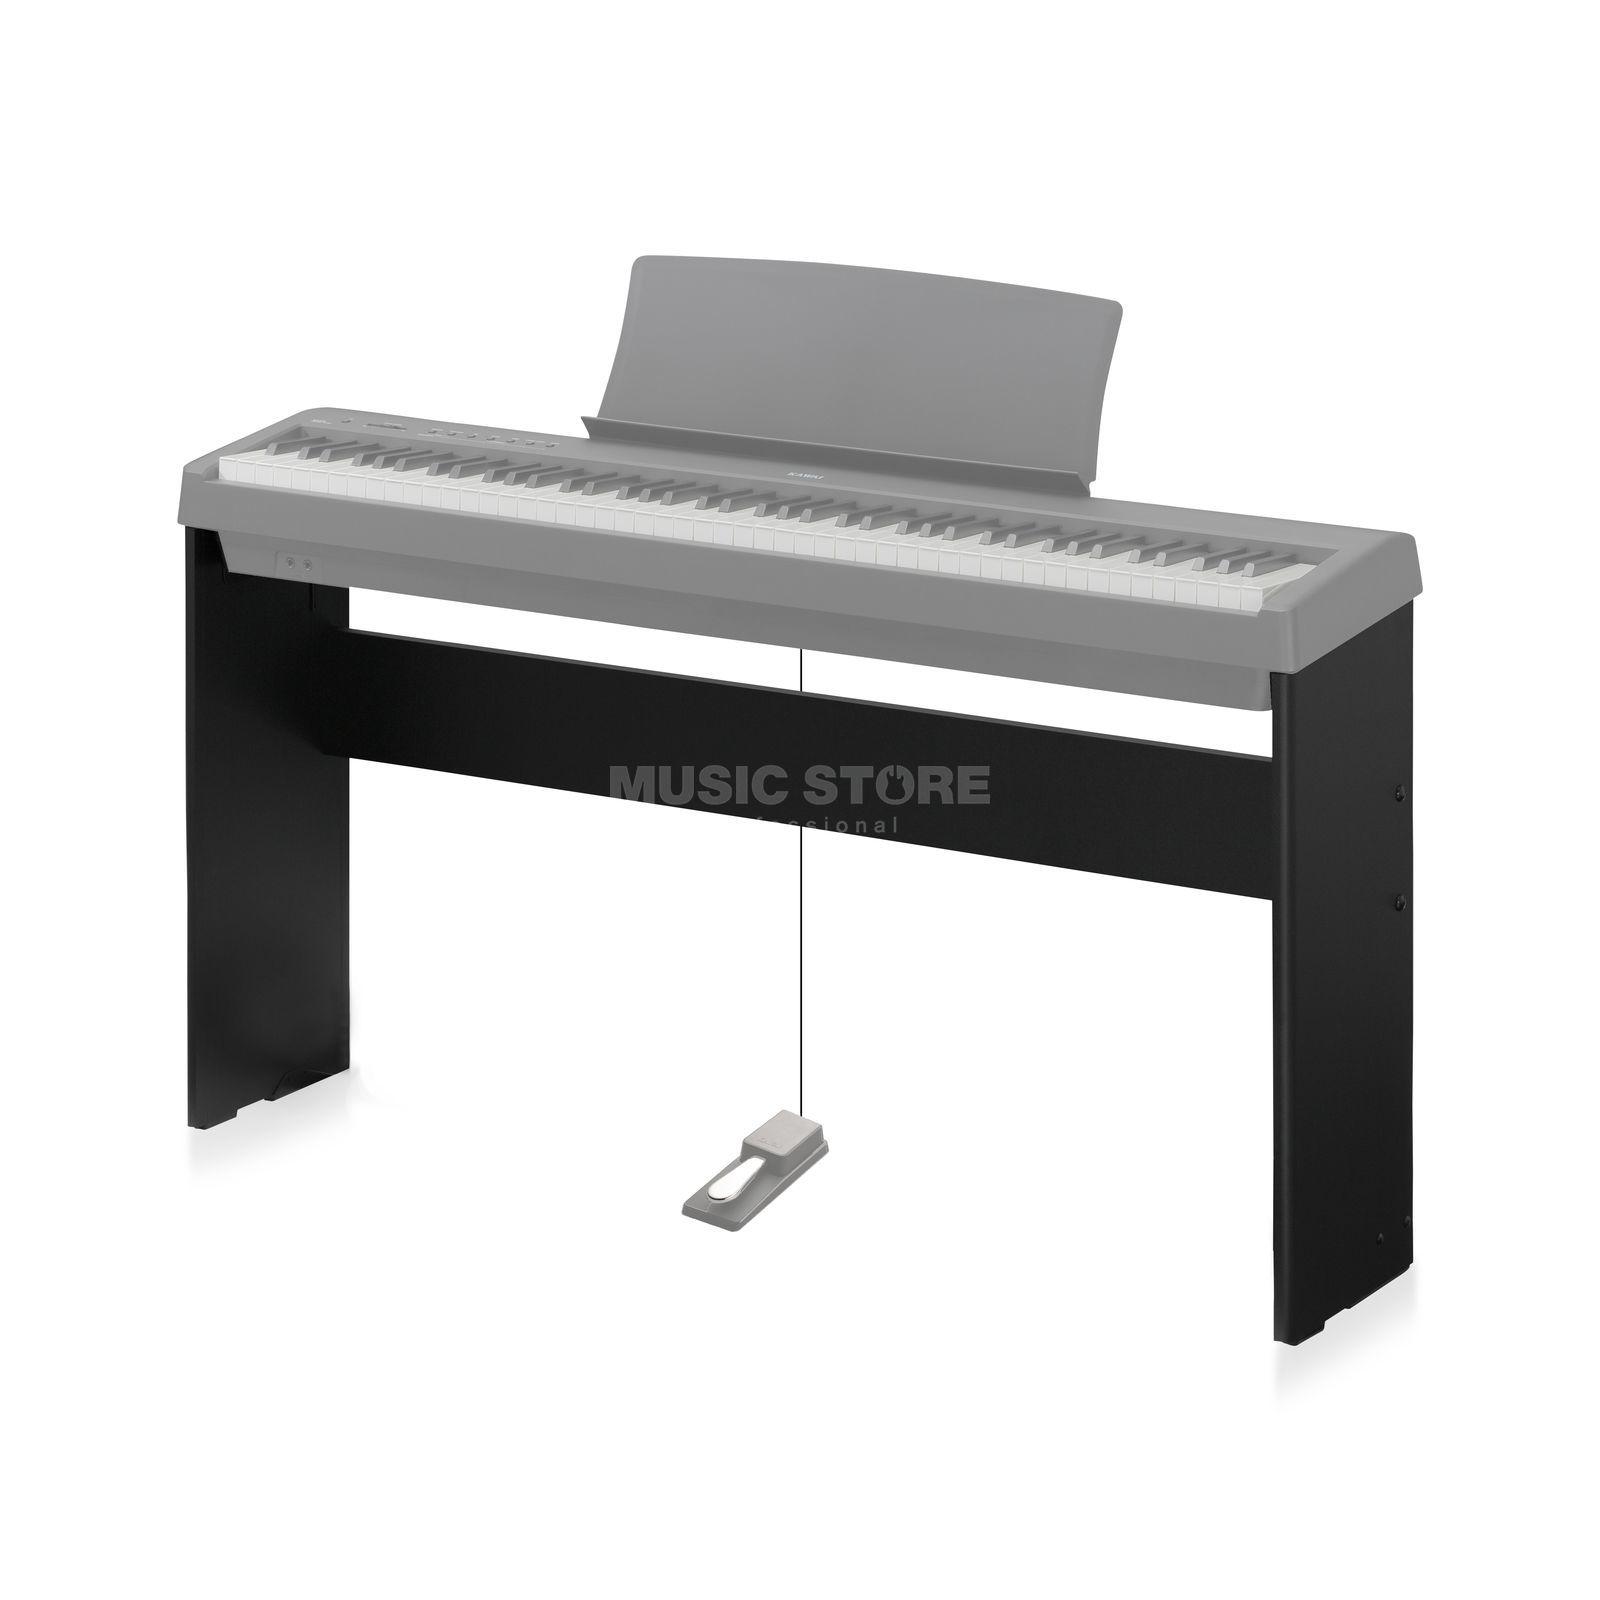 kawai hml 1 furniture style stand for kawai es100. Black Bedroom Furniture Sets. Home Design Ideas